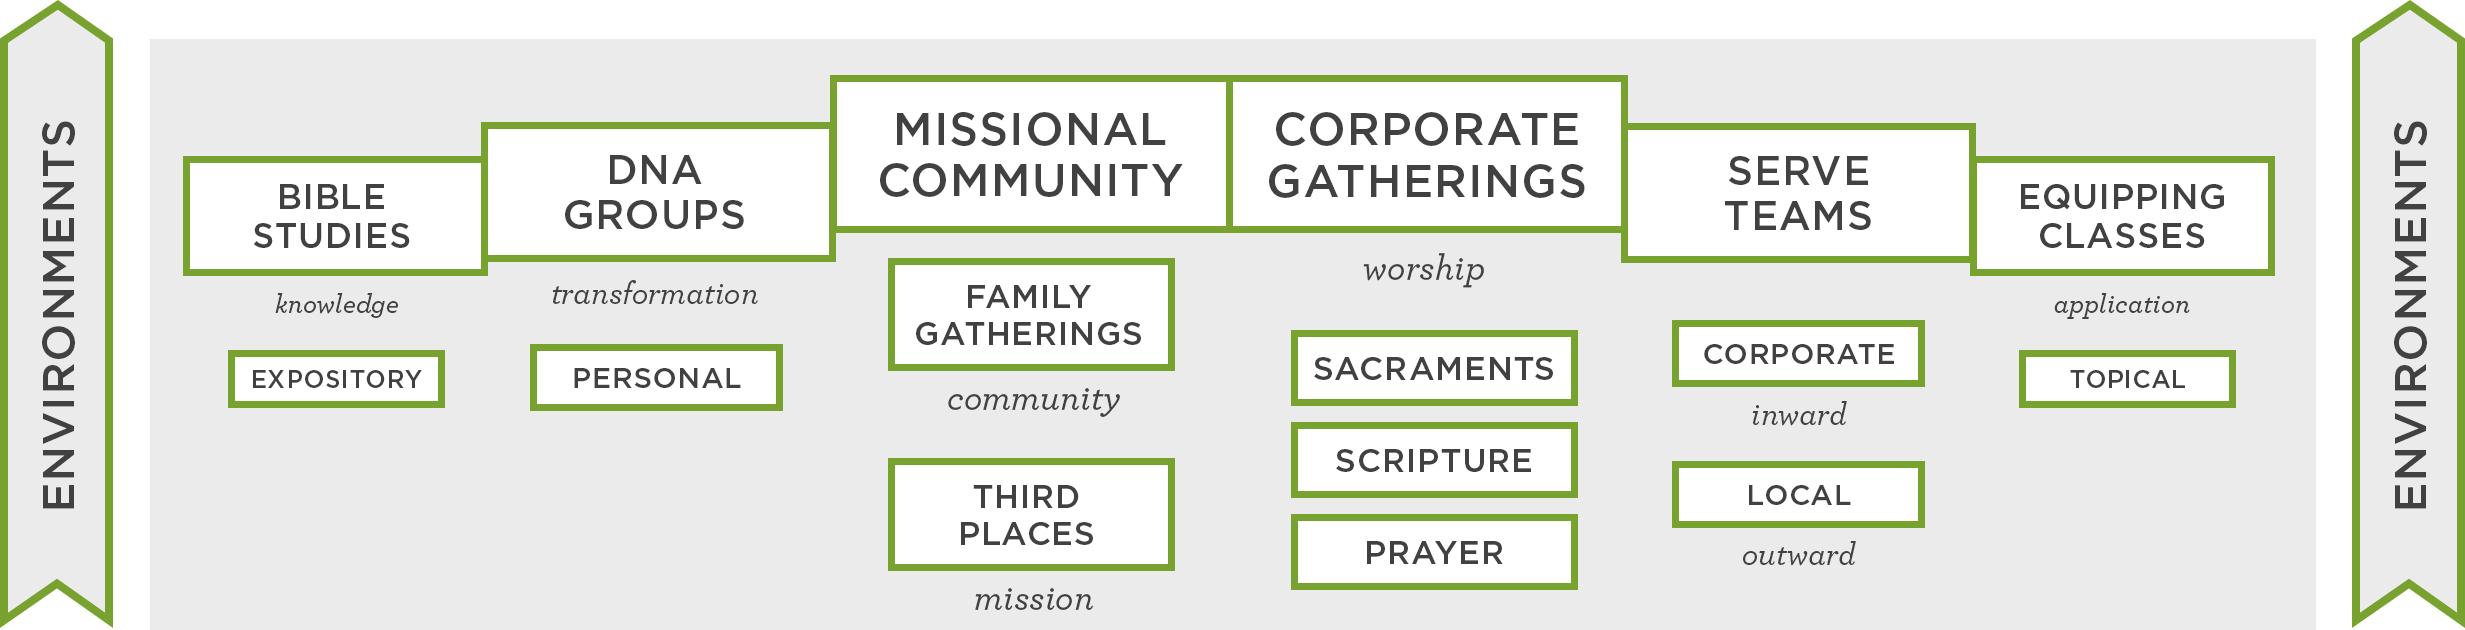 Discipleship Framework - Environments.jpg